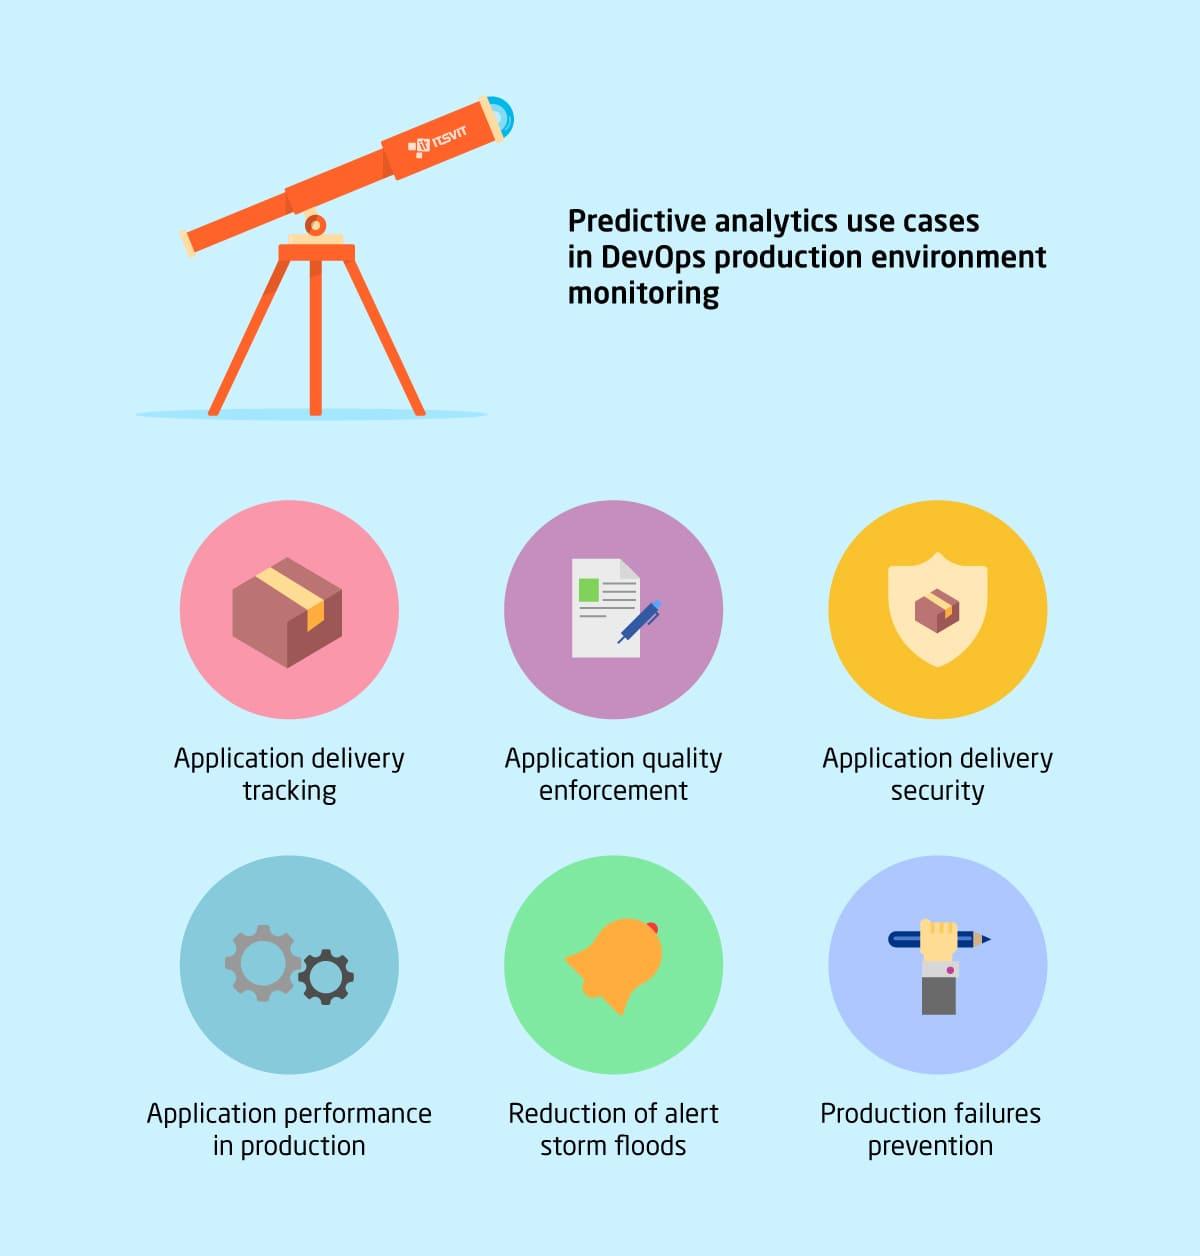 Predictive Analytics in DevOps: Applications and Benefits - DZone DevOps